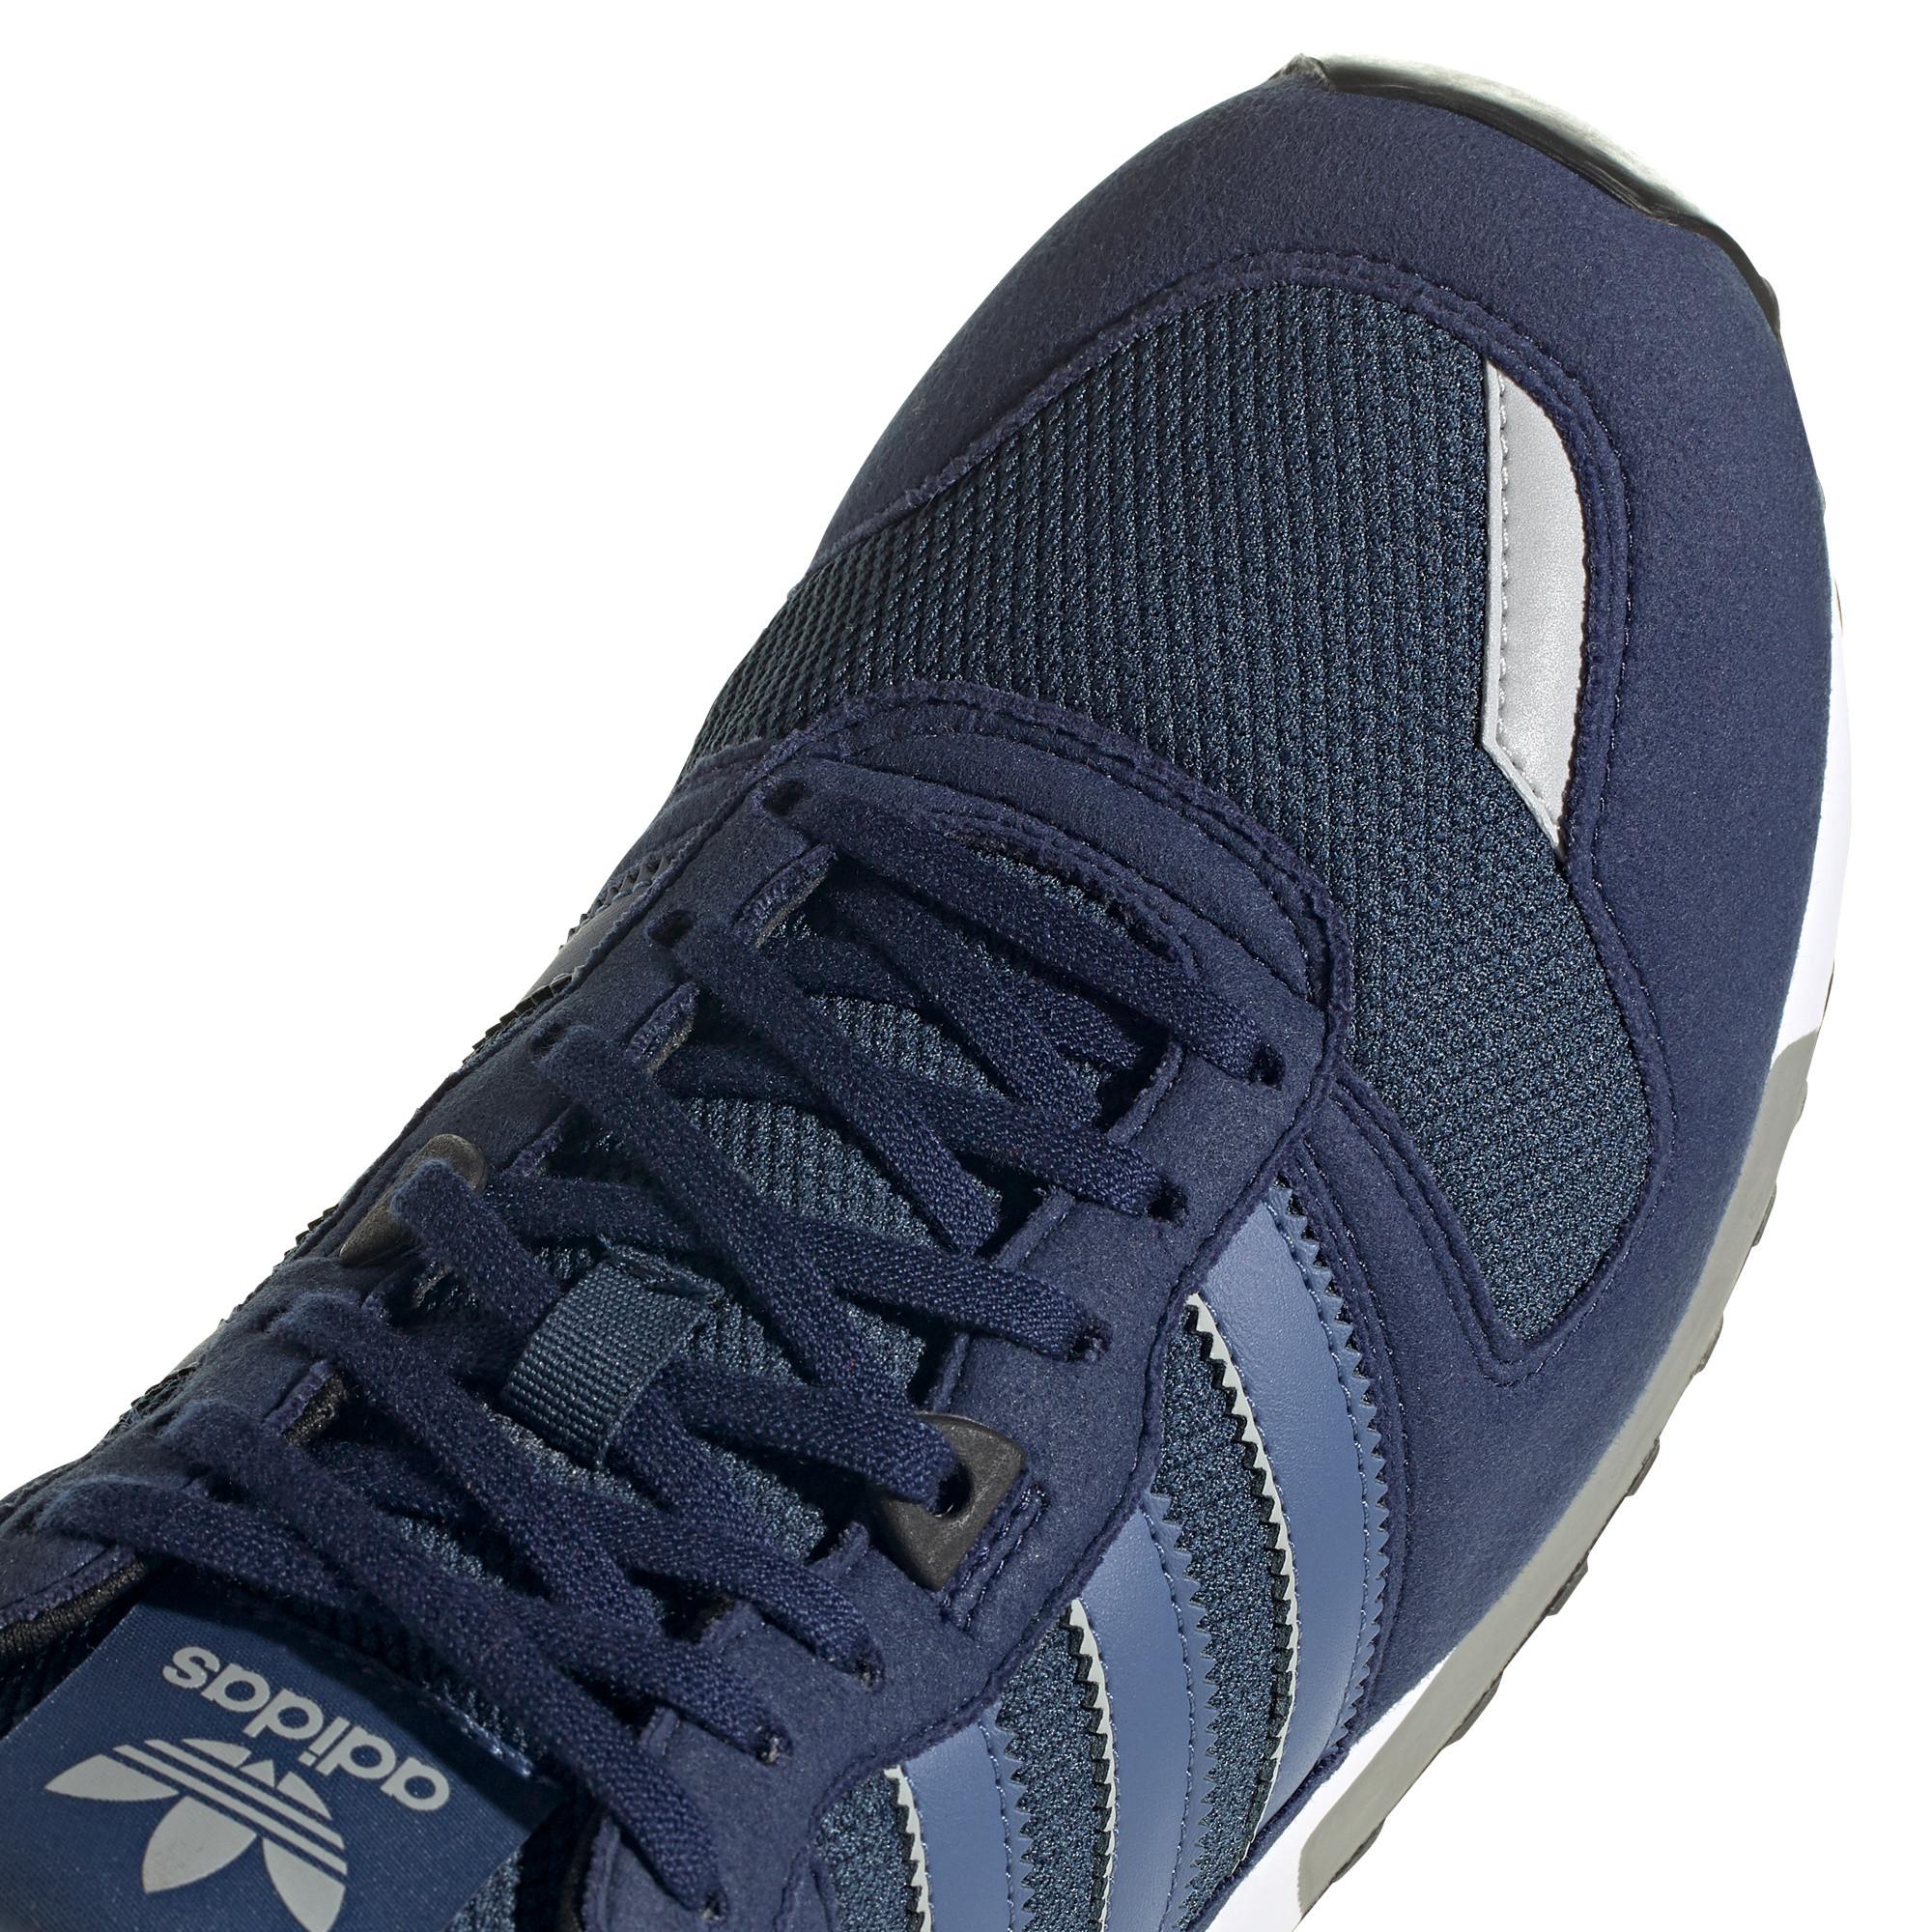 Scarpe uomo ZX 700, Blu scuro, large image number 5